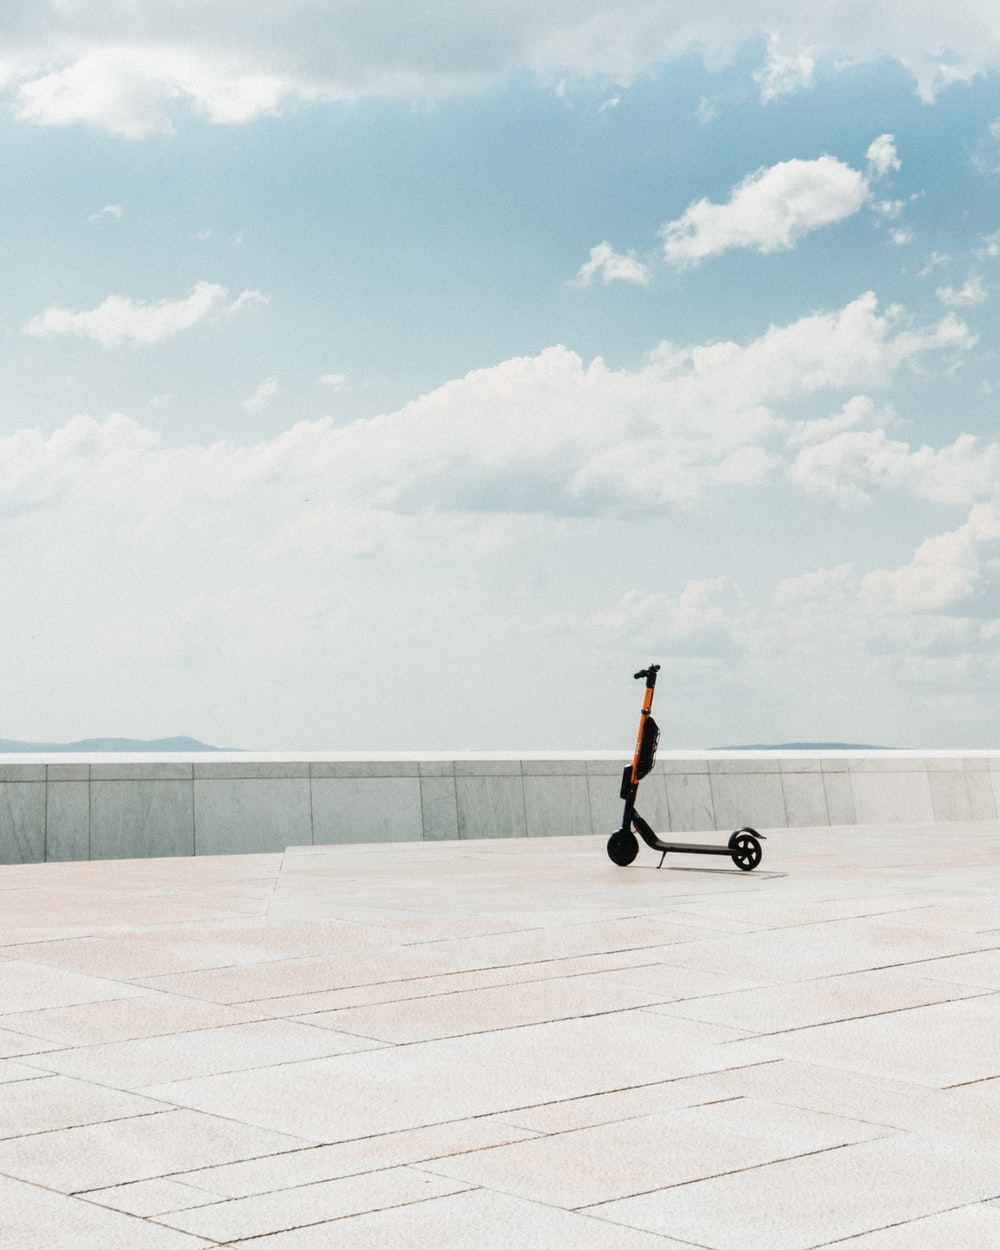 black kick scooter parked on concrete floor